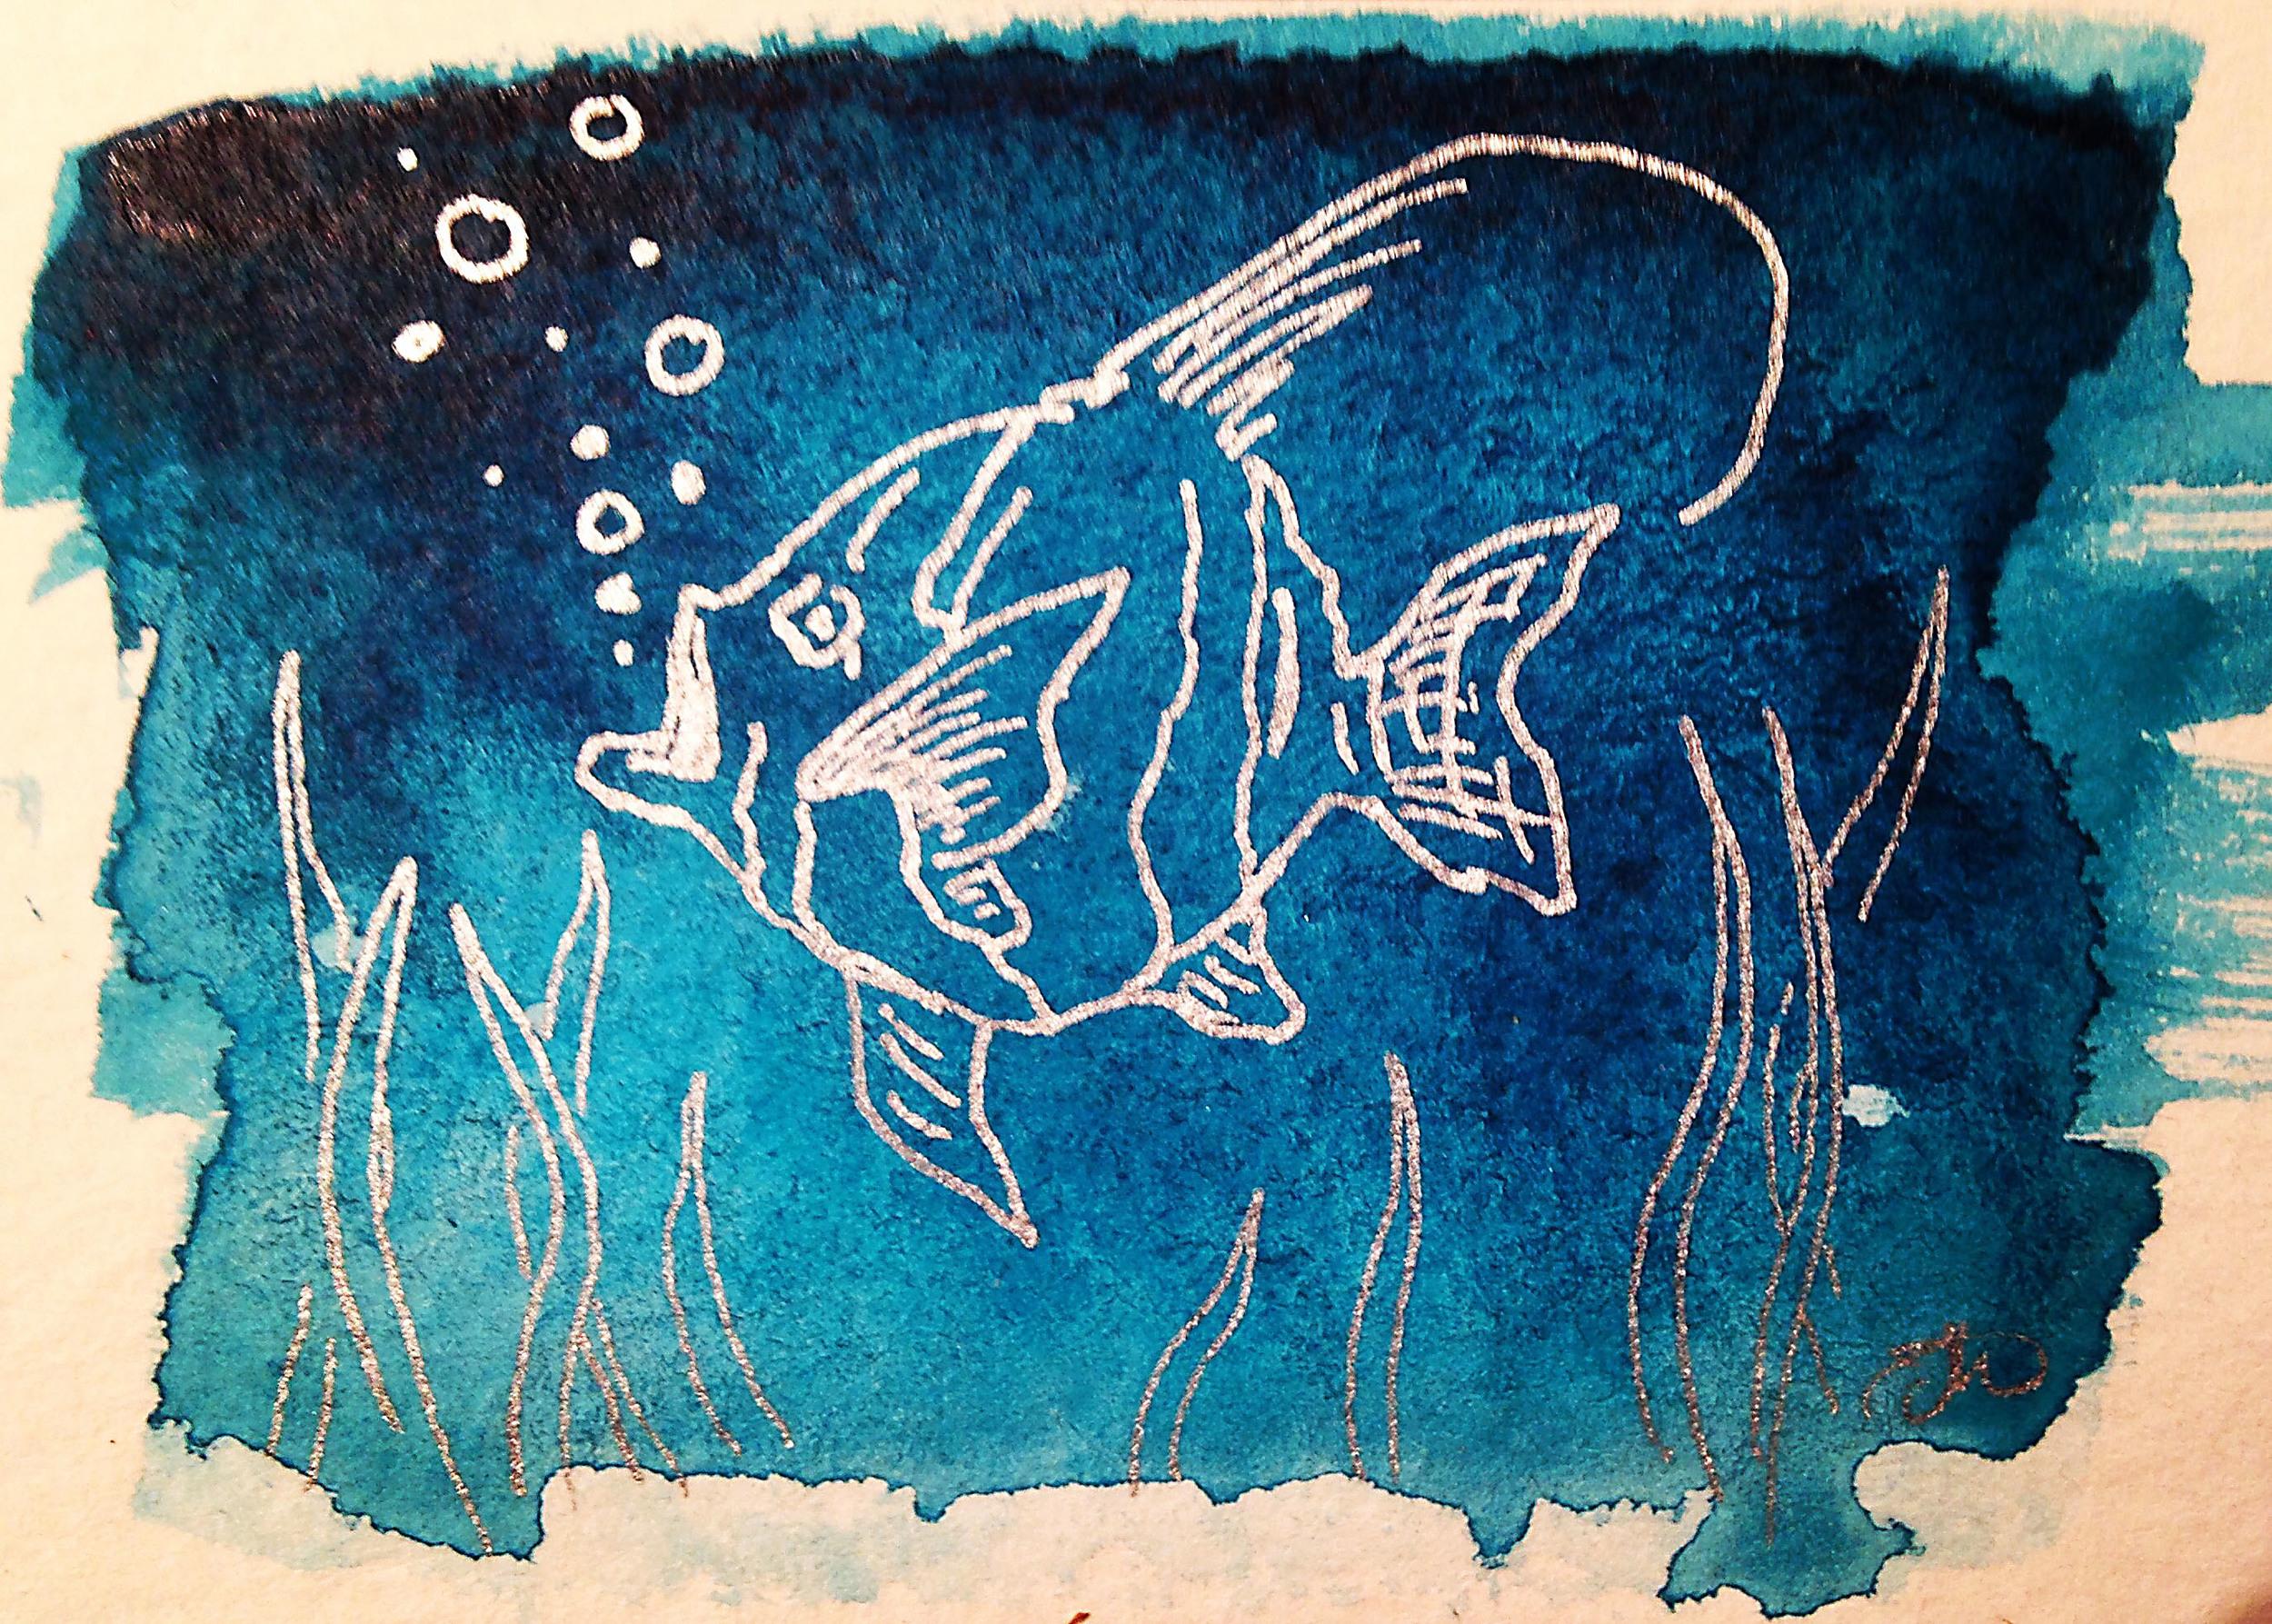 Day 6, 'Zanclus cornutus or Fishie'